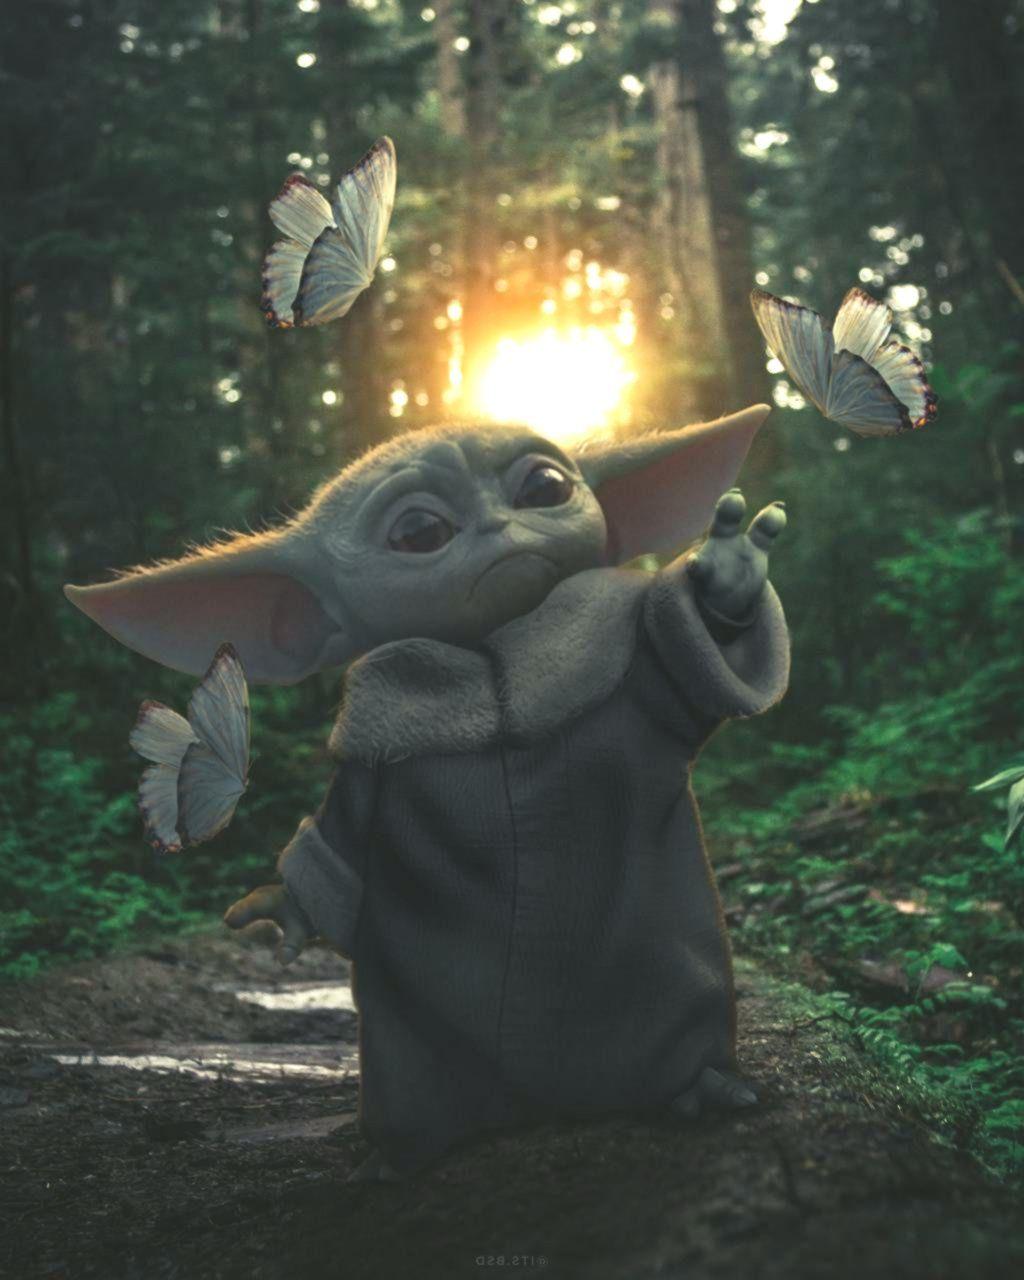 Baby Yoda Wallpaper Zedge - Wallpaper